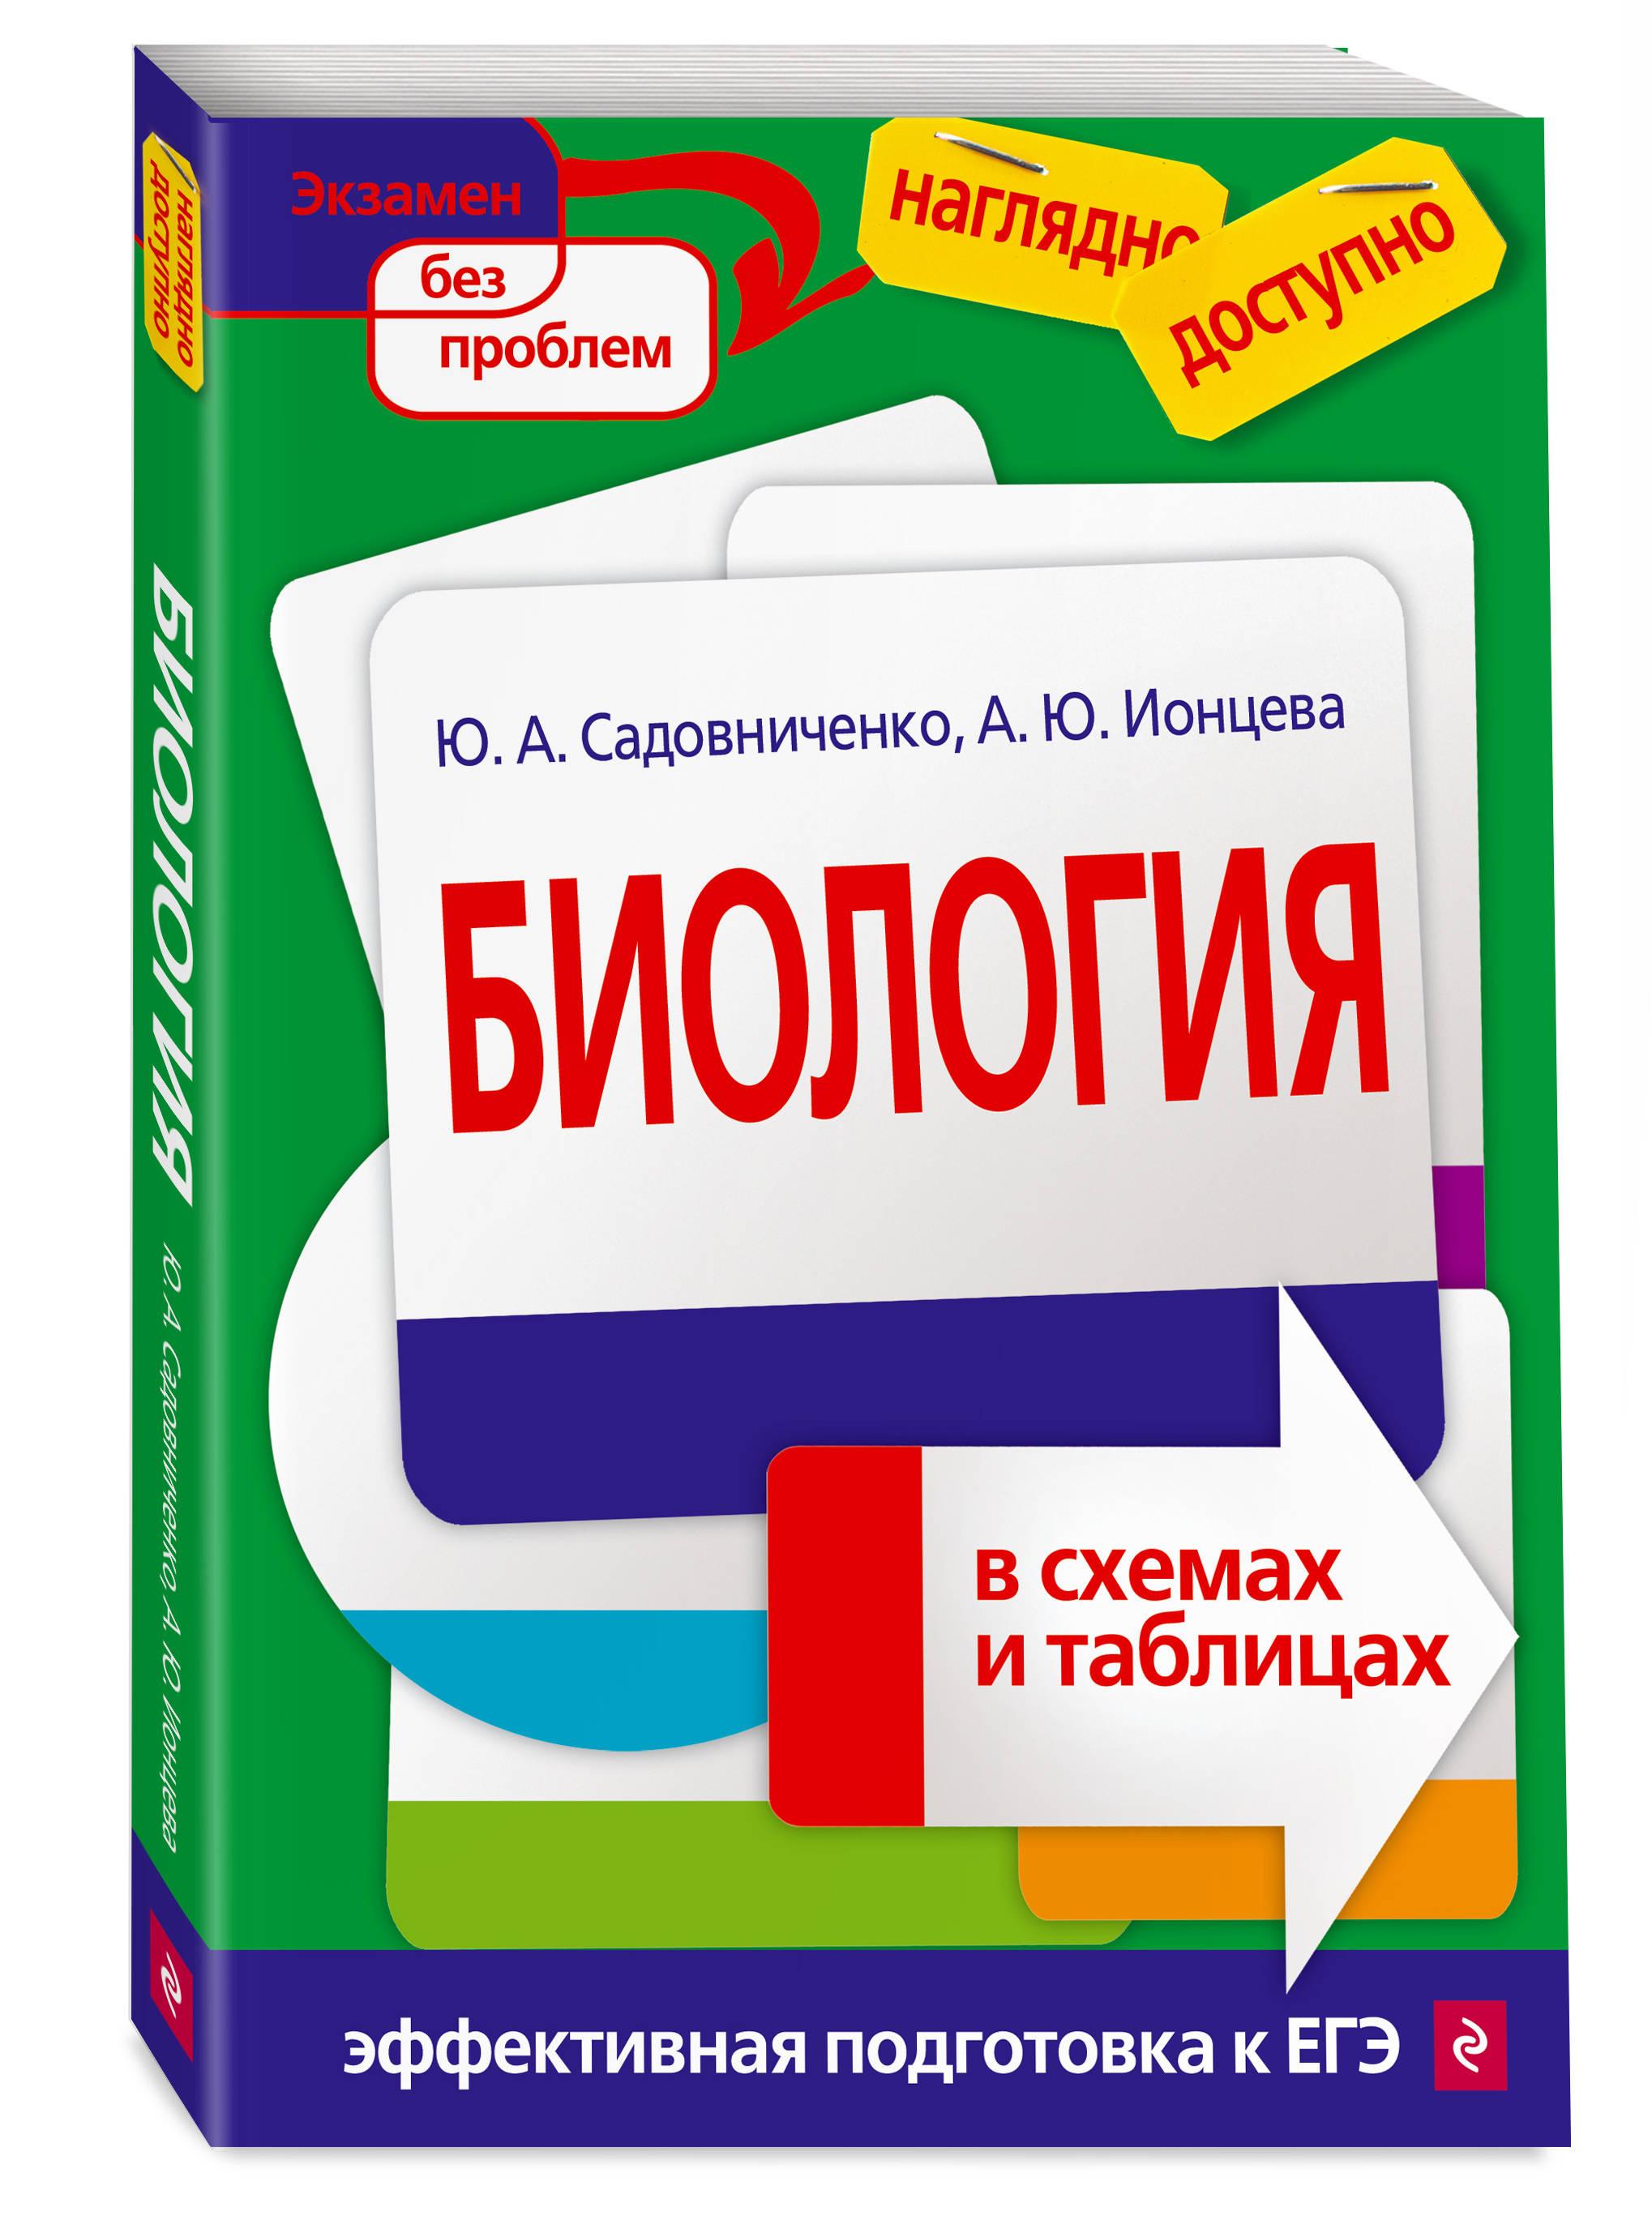 Ю. А. Садовниченко, А. Ю. Ионцева Биология в схемах и таблицах сапоги cat сапоги и ботфорты на каблуке